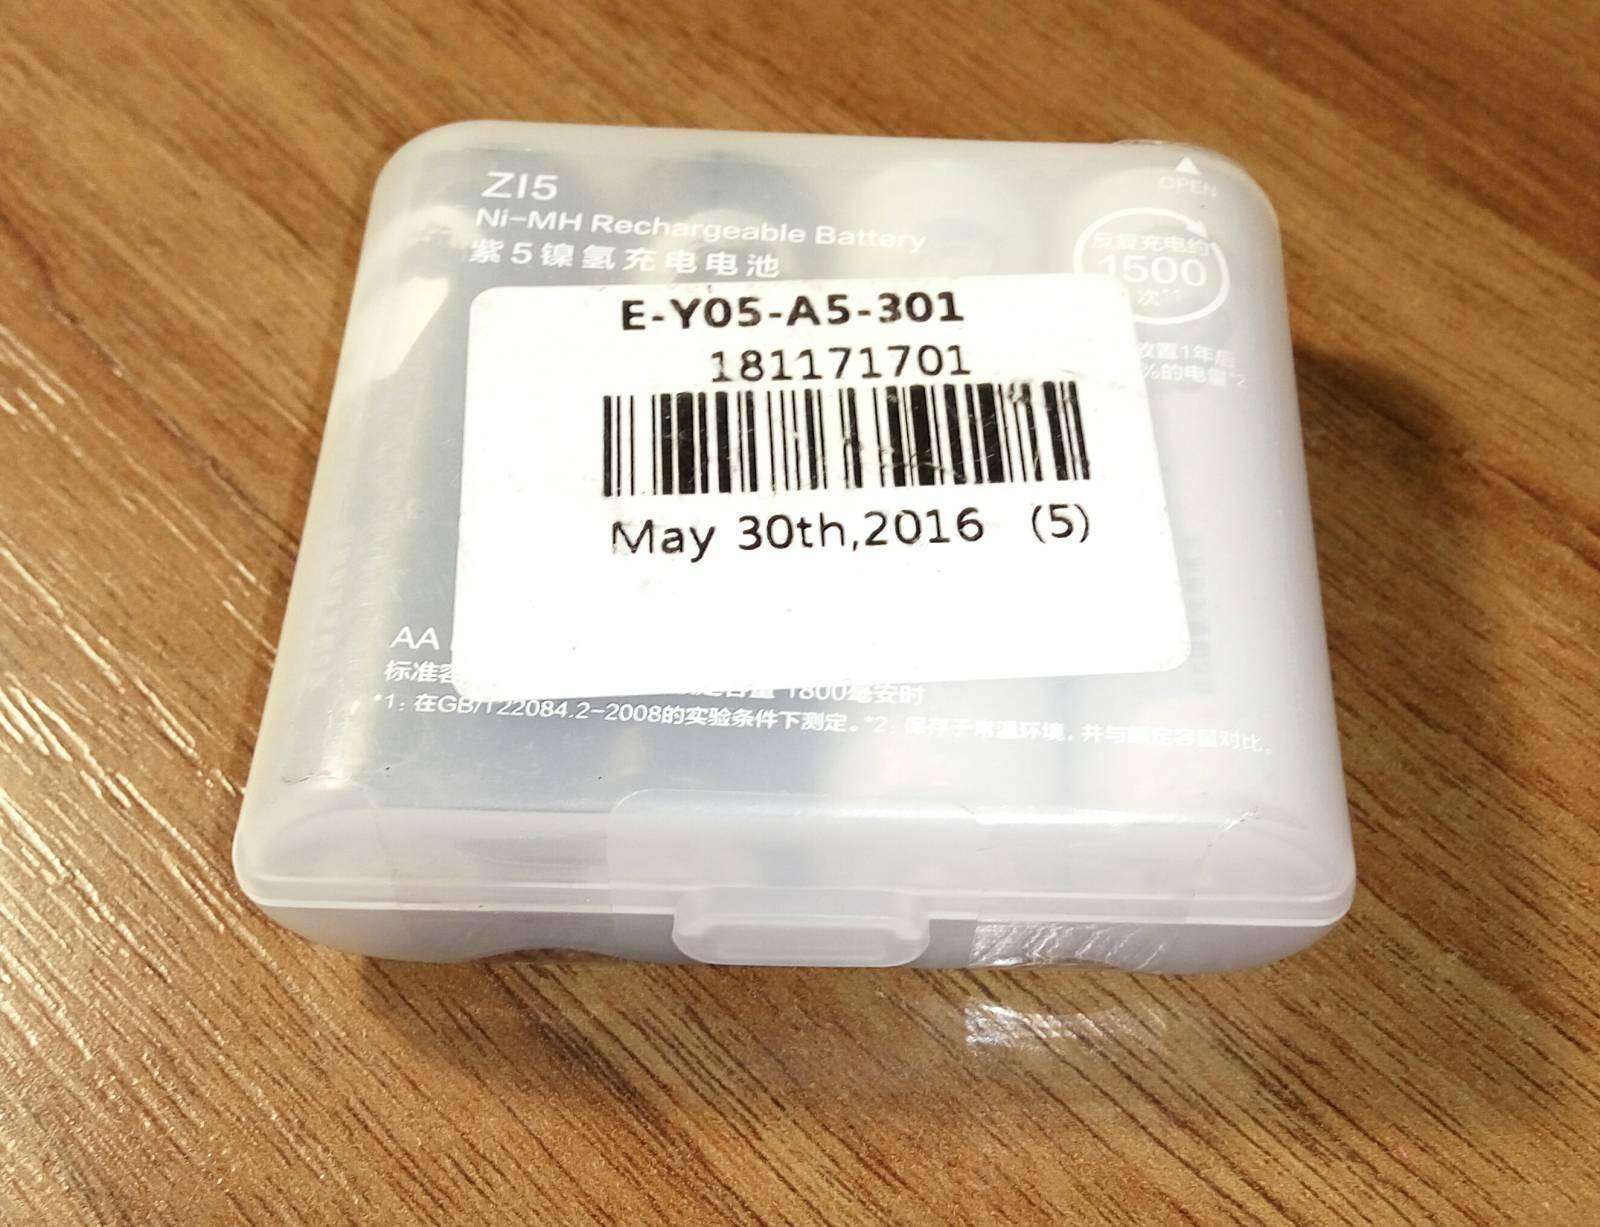 GearBest: Обзор Ni MH аккумуляторов Xiaomi ZI5 AA 1800mAh